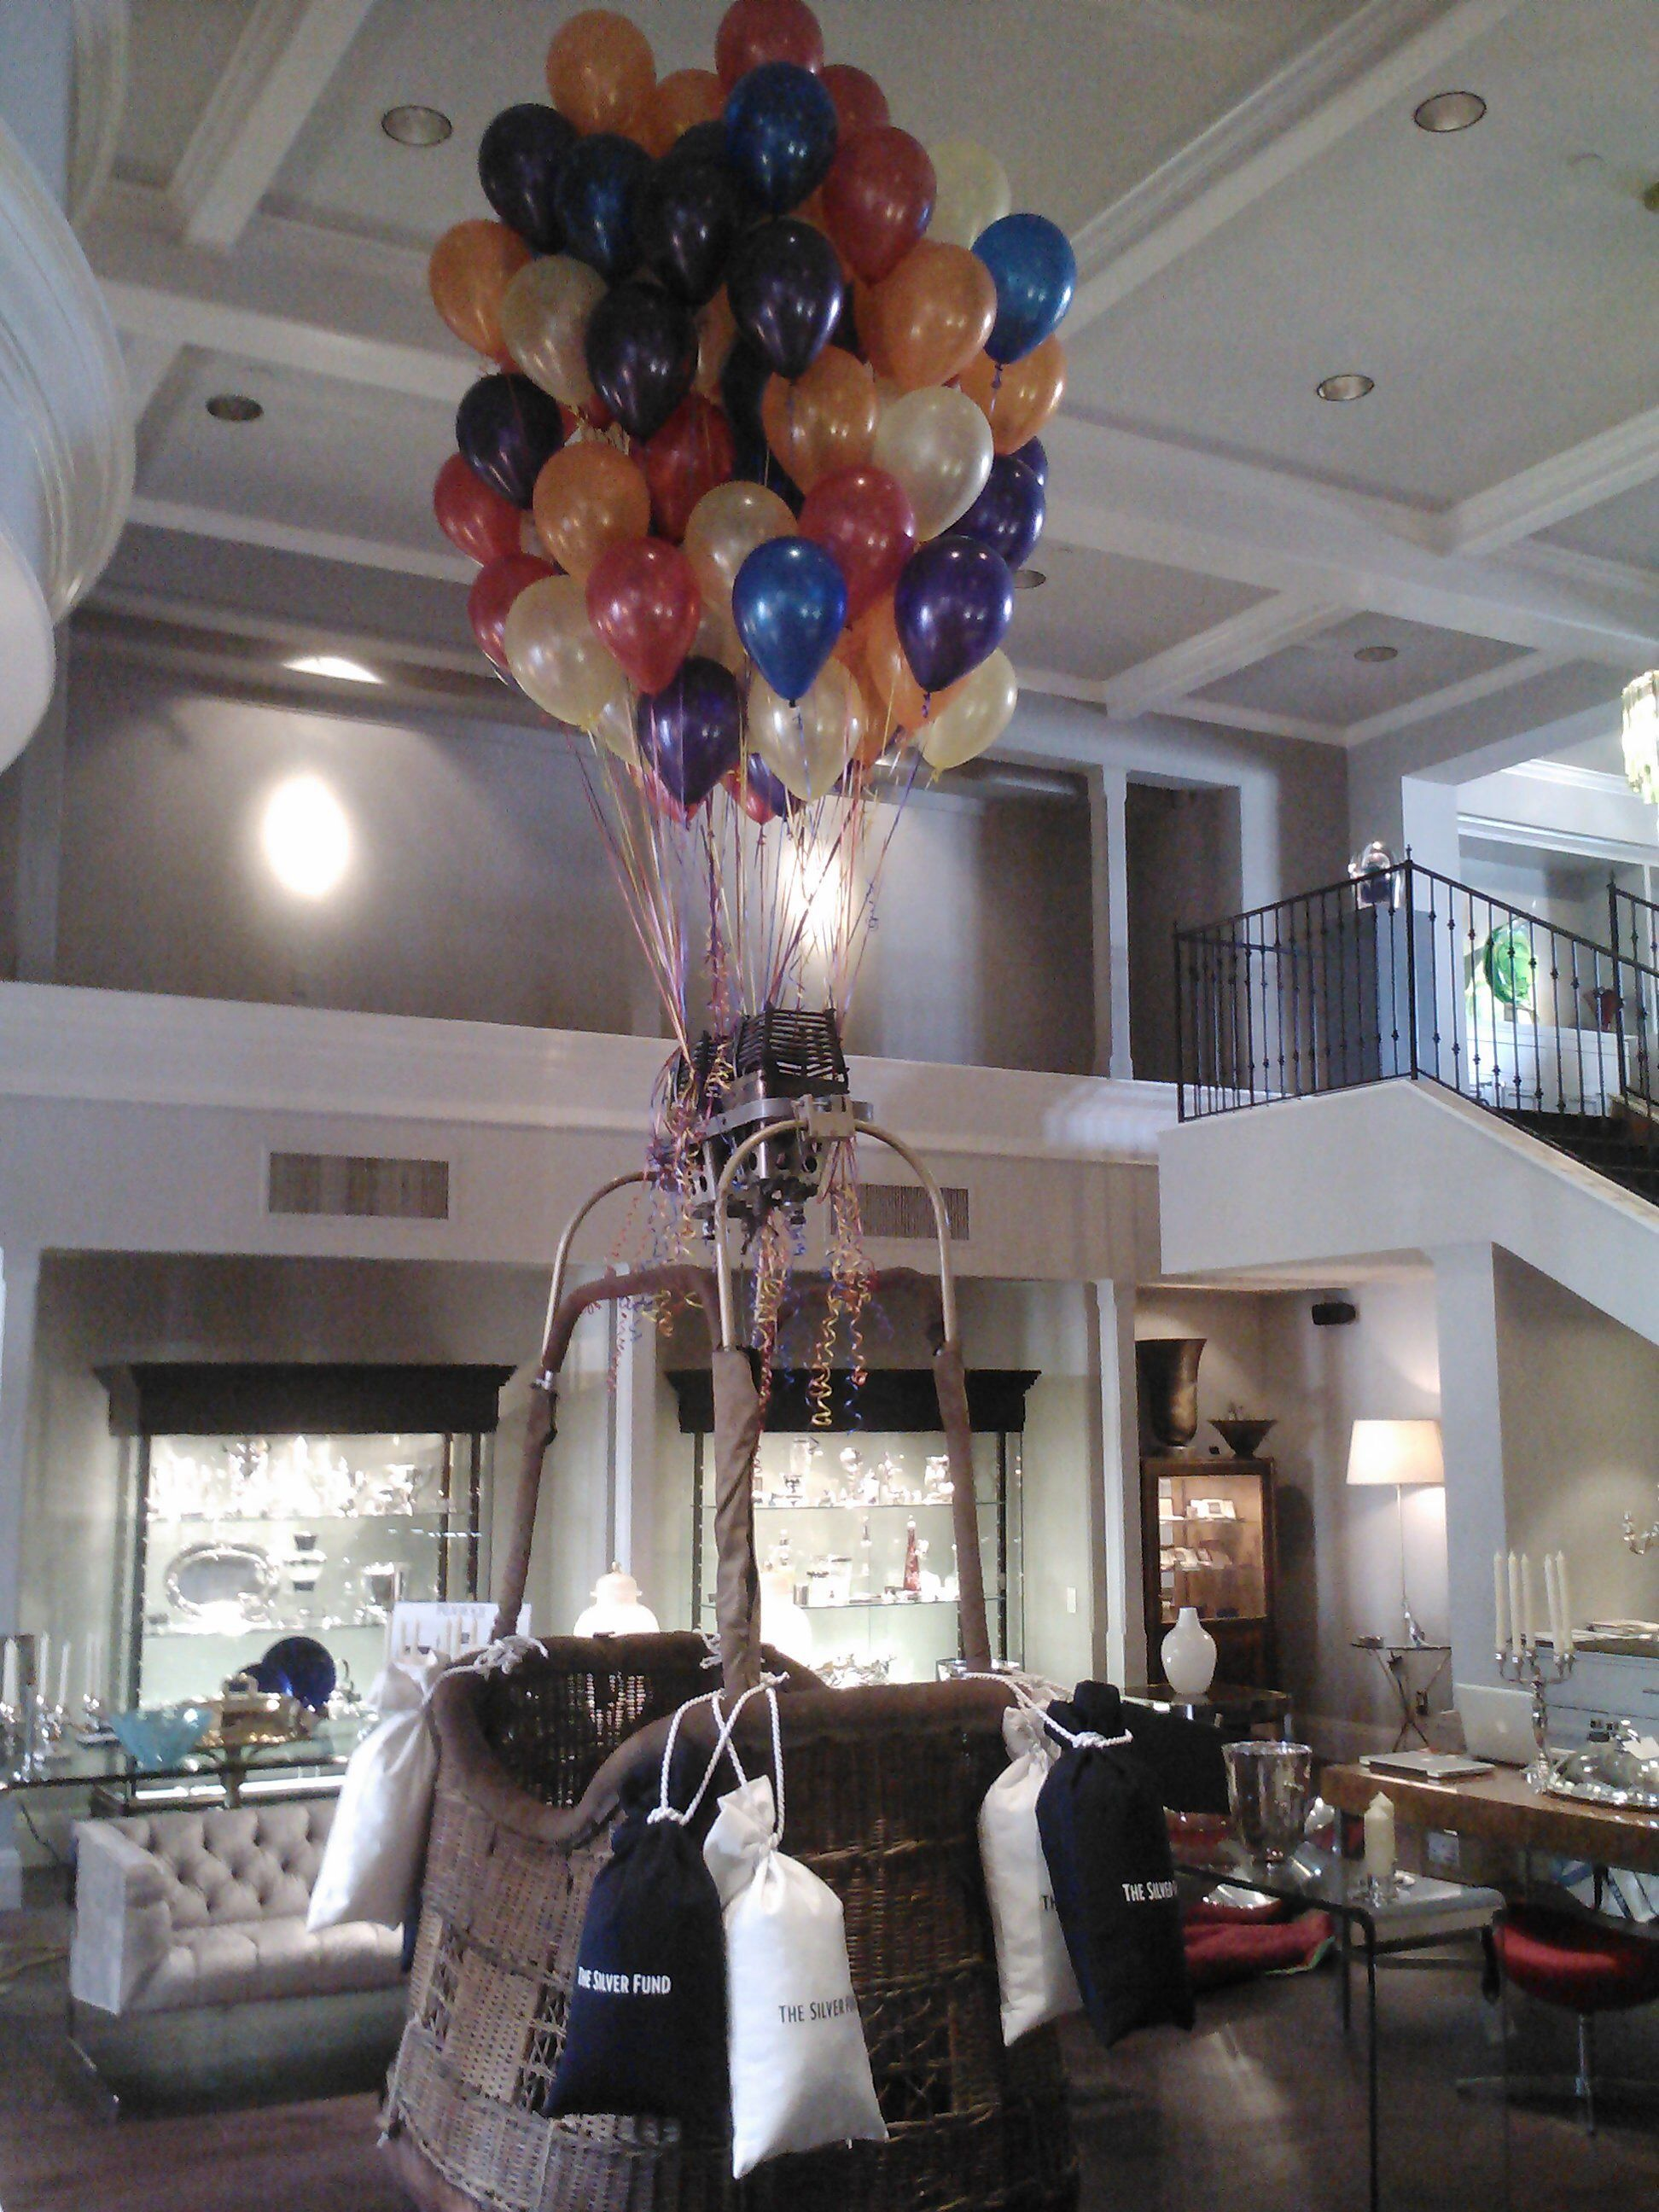 Bulk Helium Balloon Deliveries in South Florida, Balloon